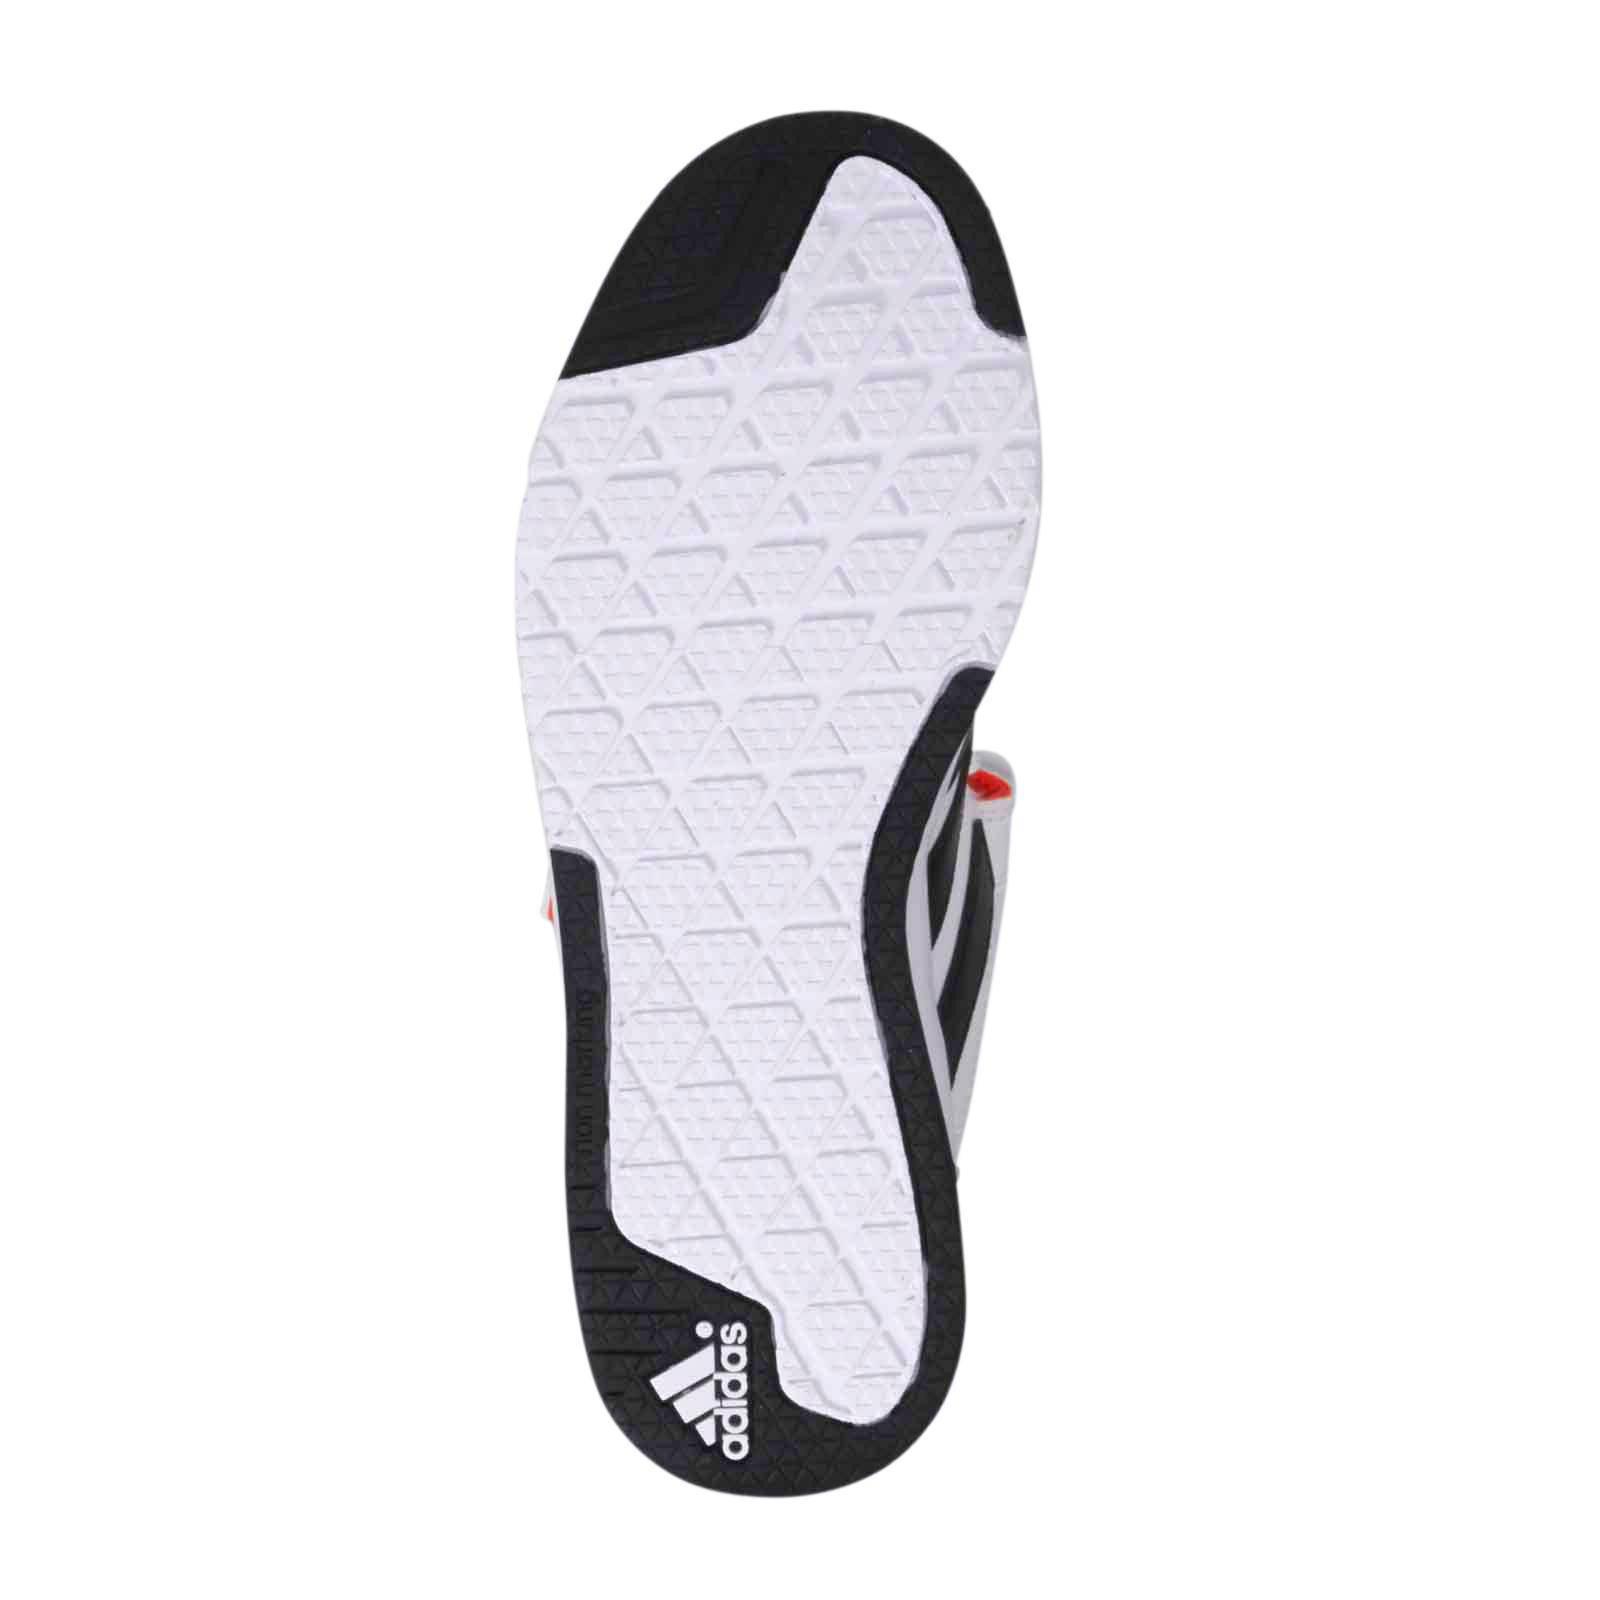 Adidas Schoenen KWehkamp 2 Lk Performance Sport Fitness Cf